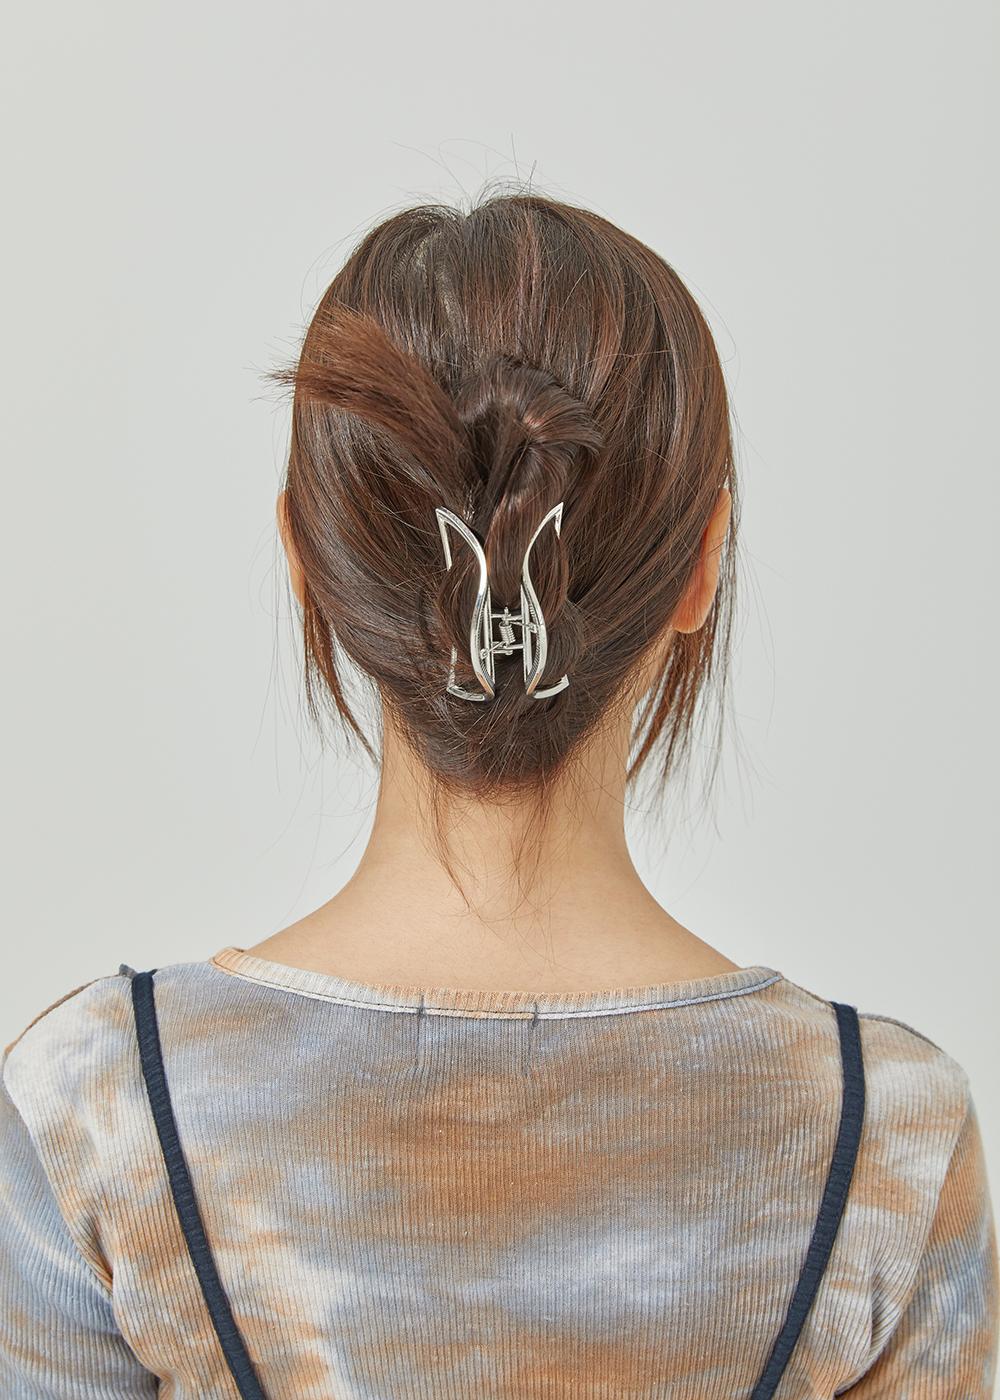 Half moon metal hair clippers